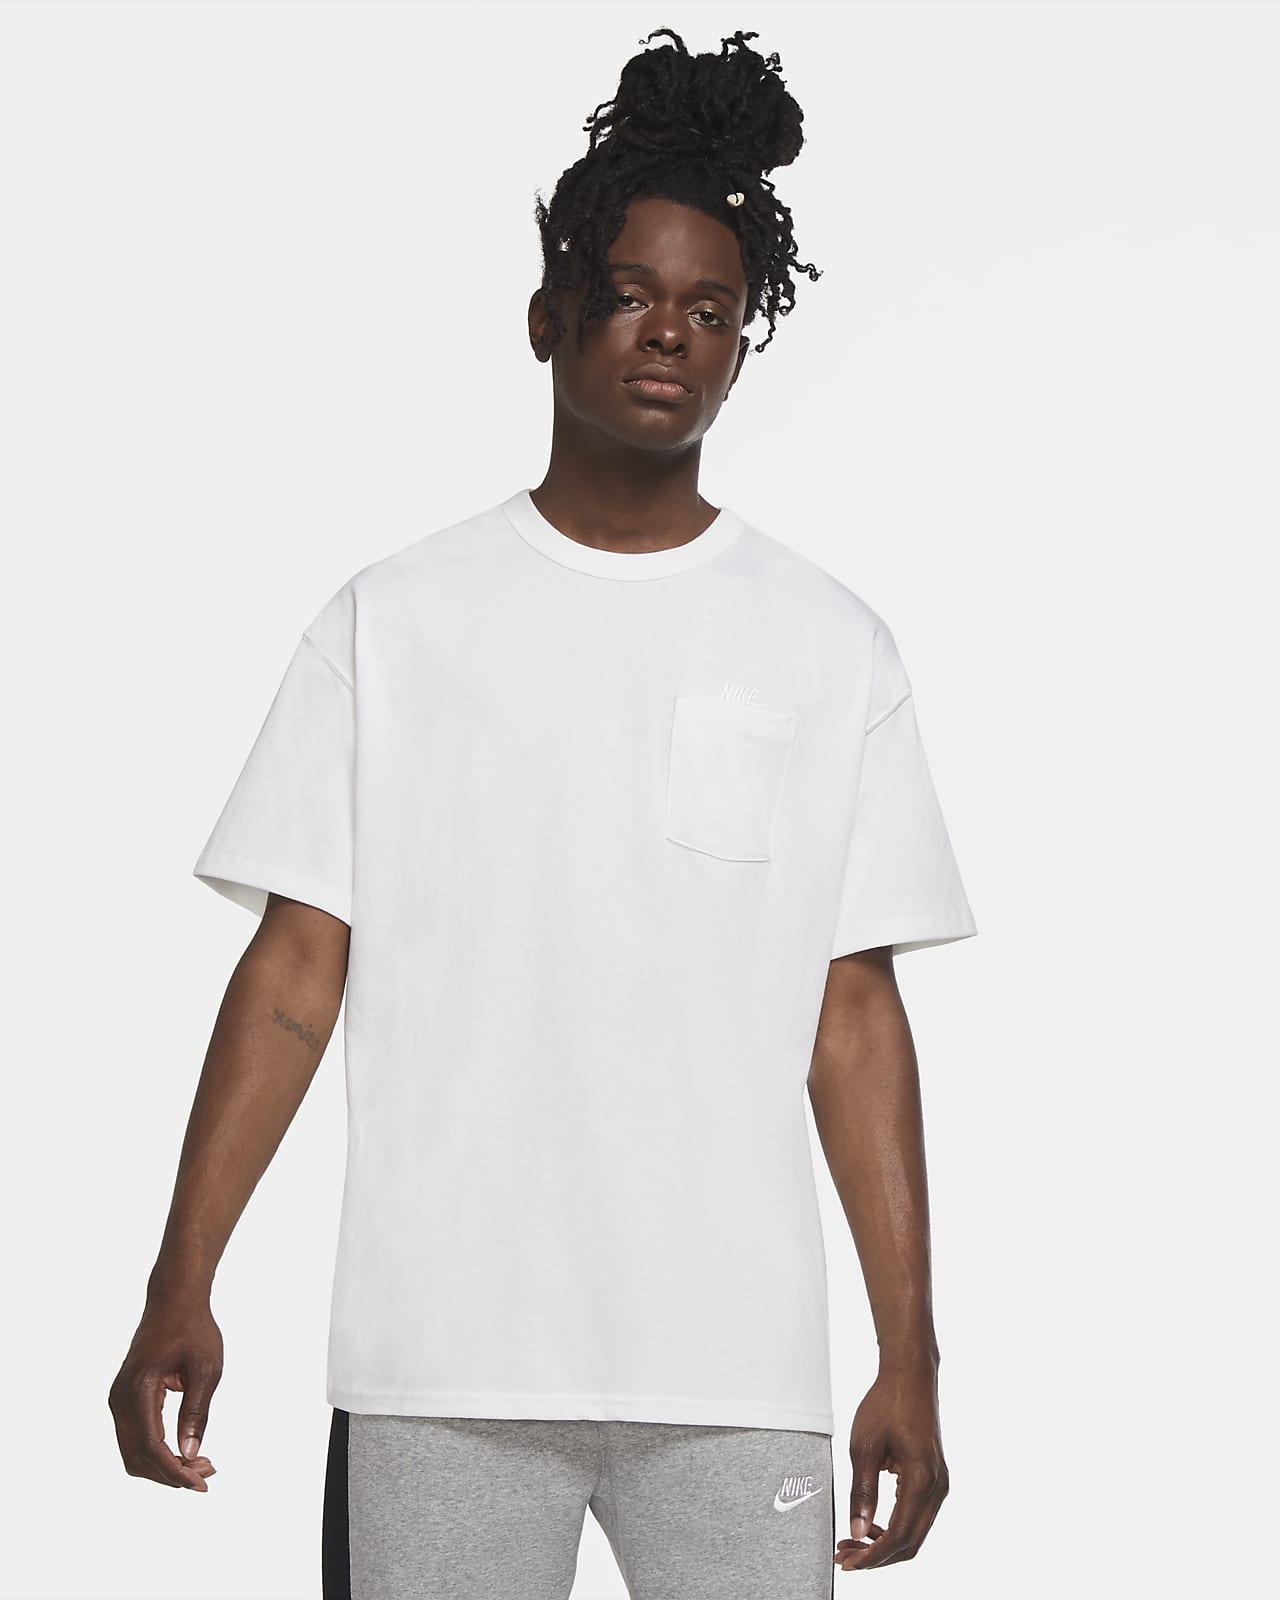 Nike Sportswear Premium Essentials Cepli Erkek Tişörtü